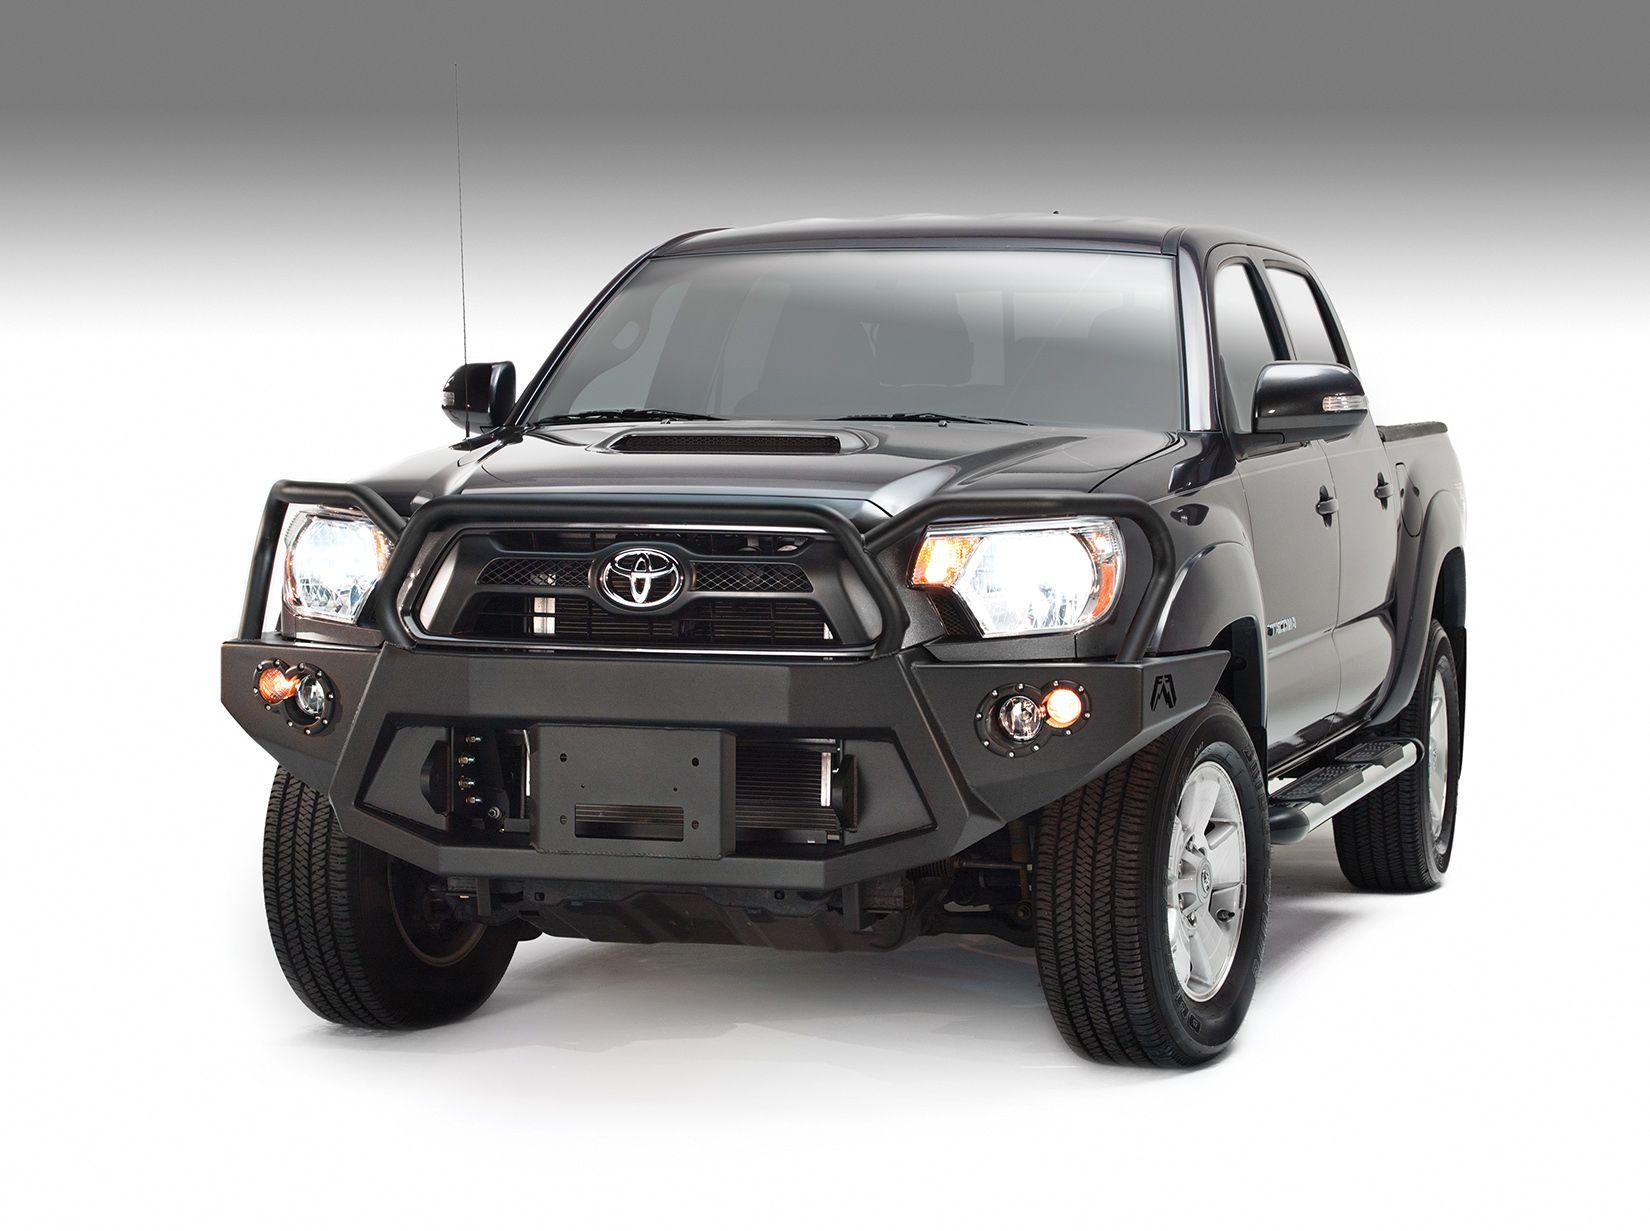 Fab fours 2012 2015 tacoma premium front bumper w full guard